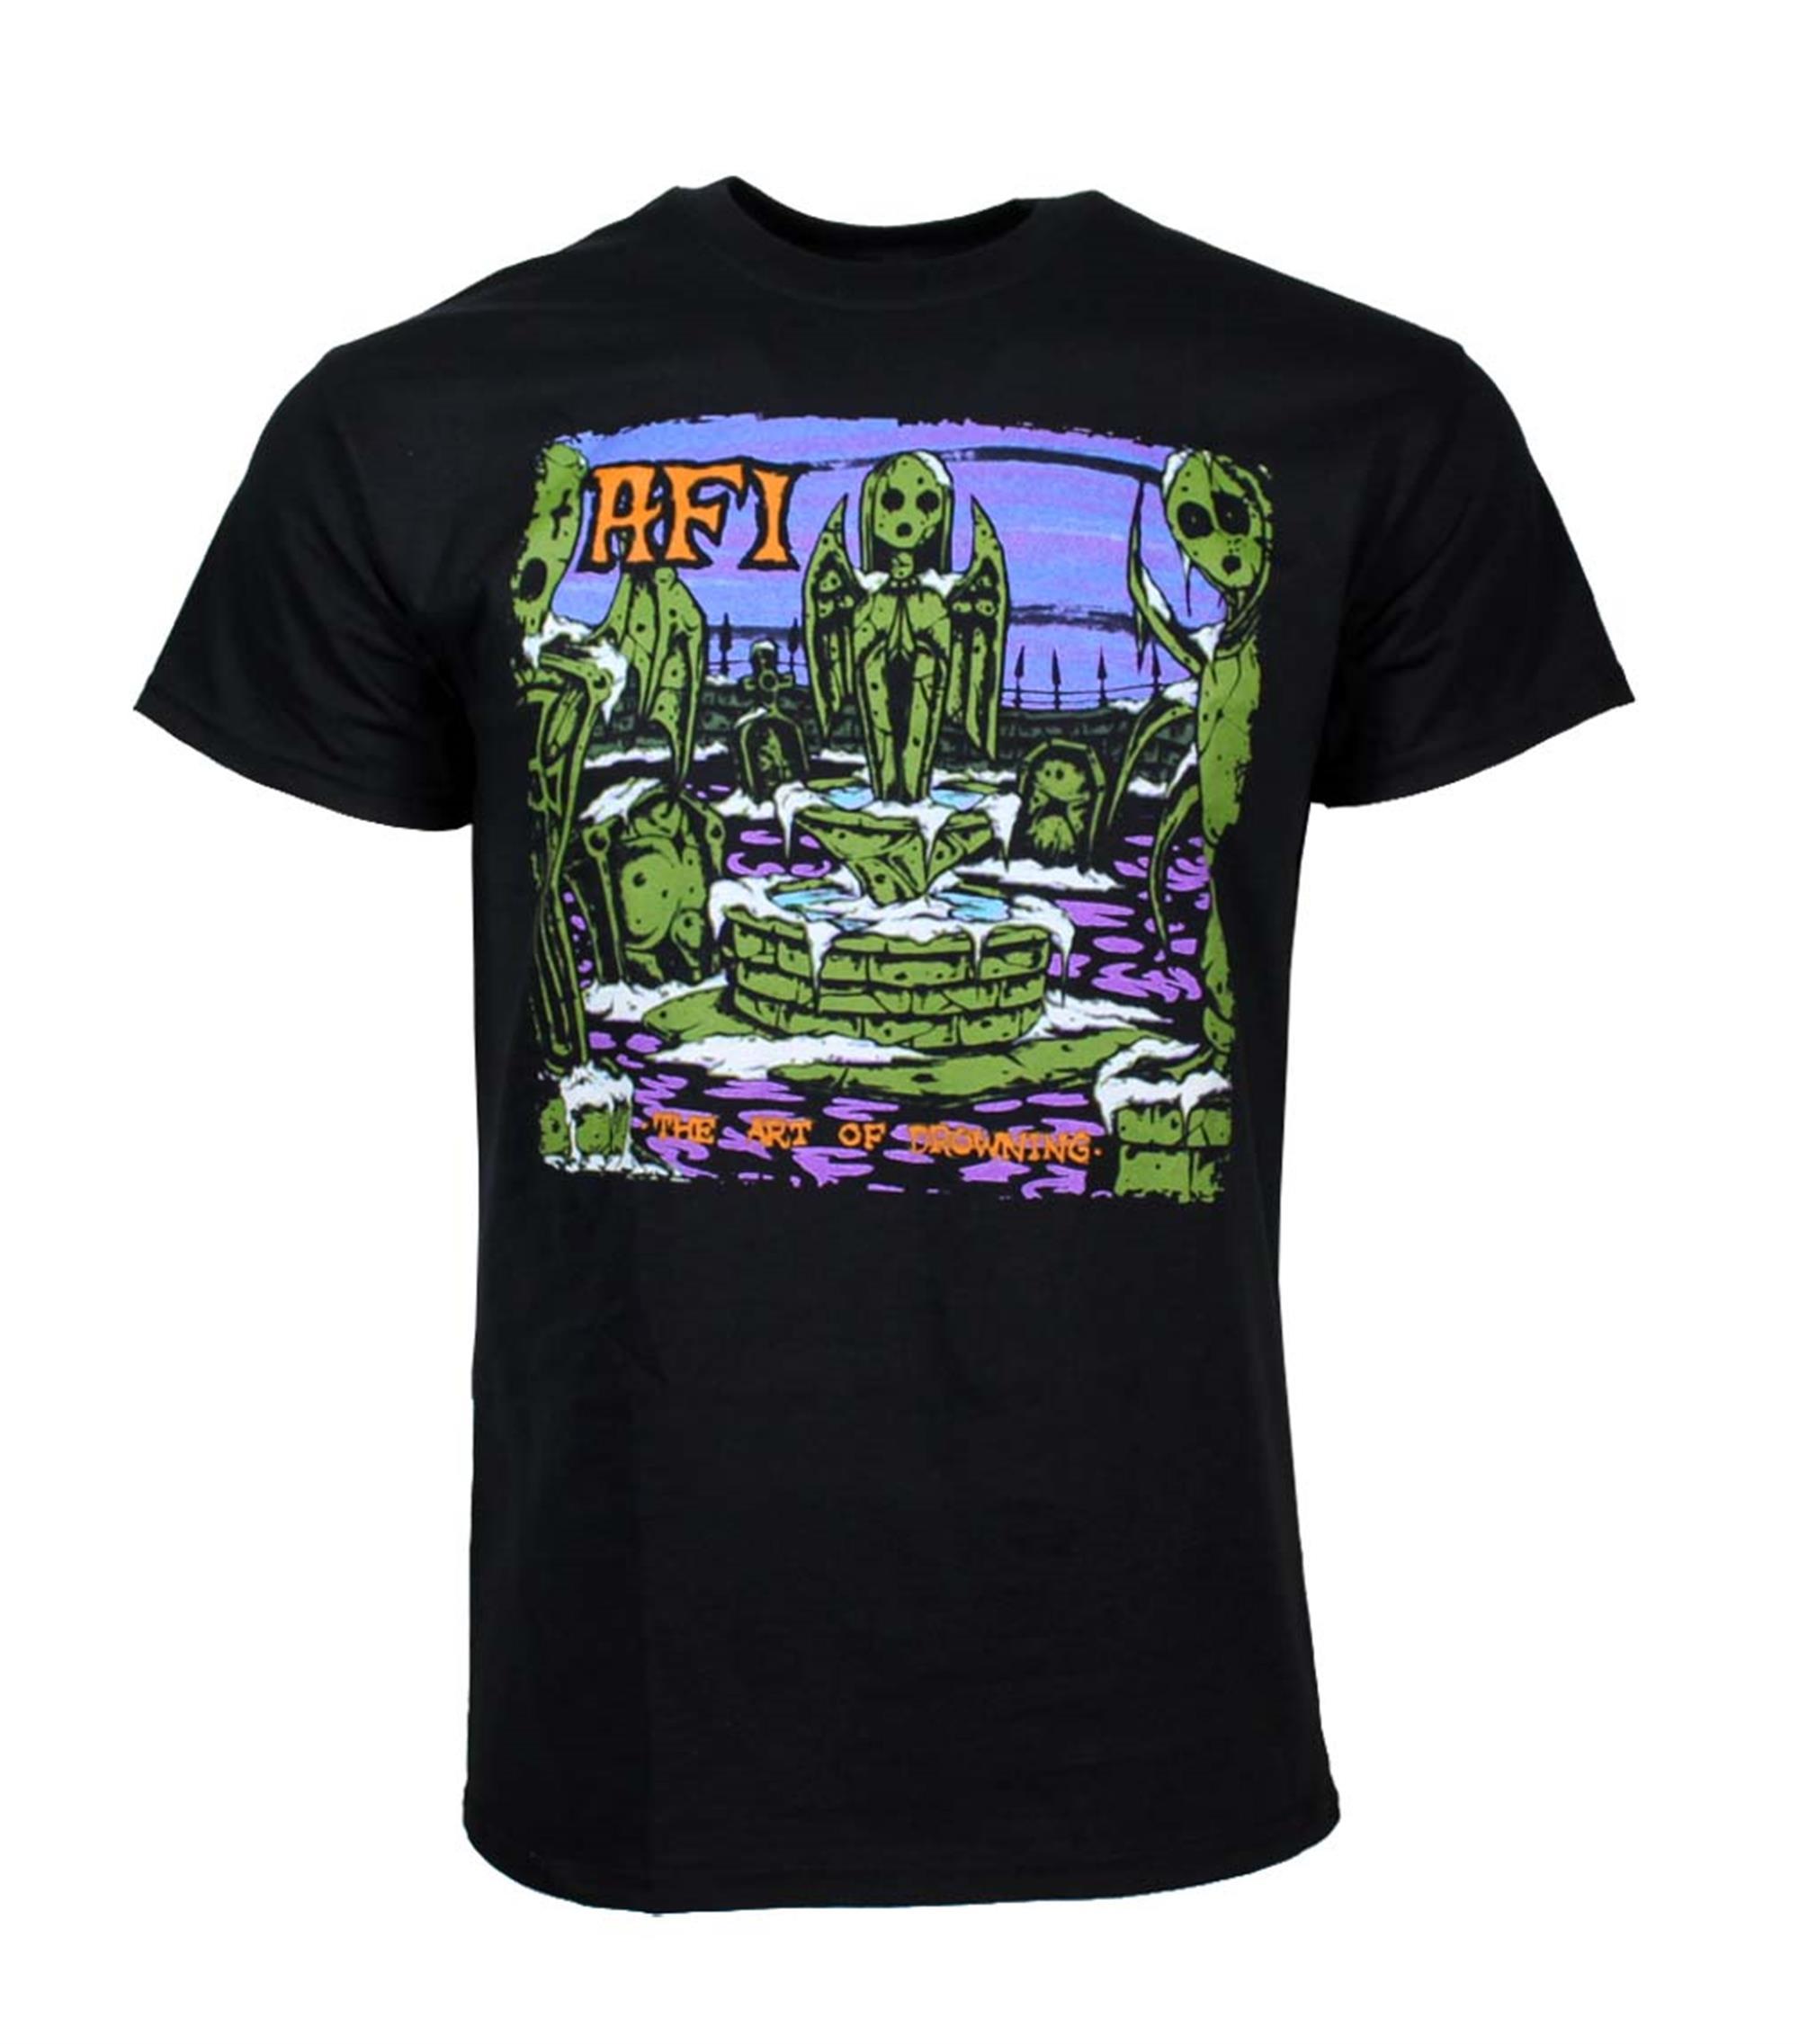 AFI Art of Drowning T-Shirt